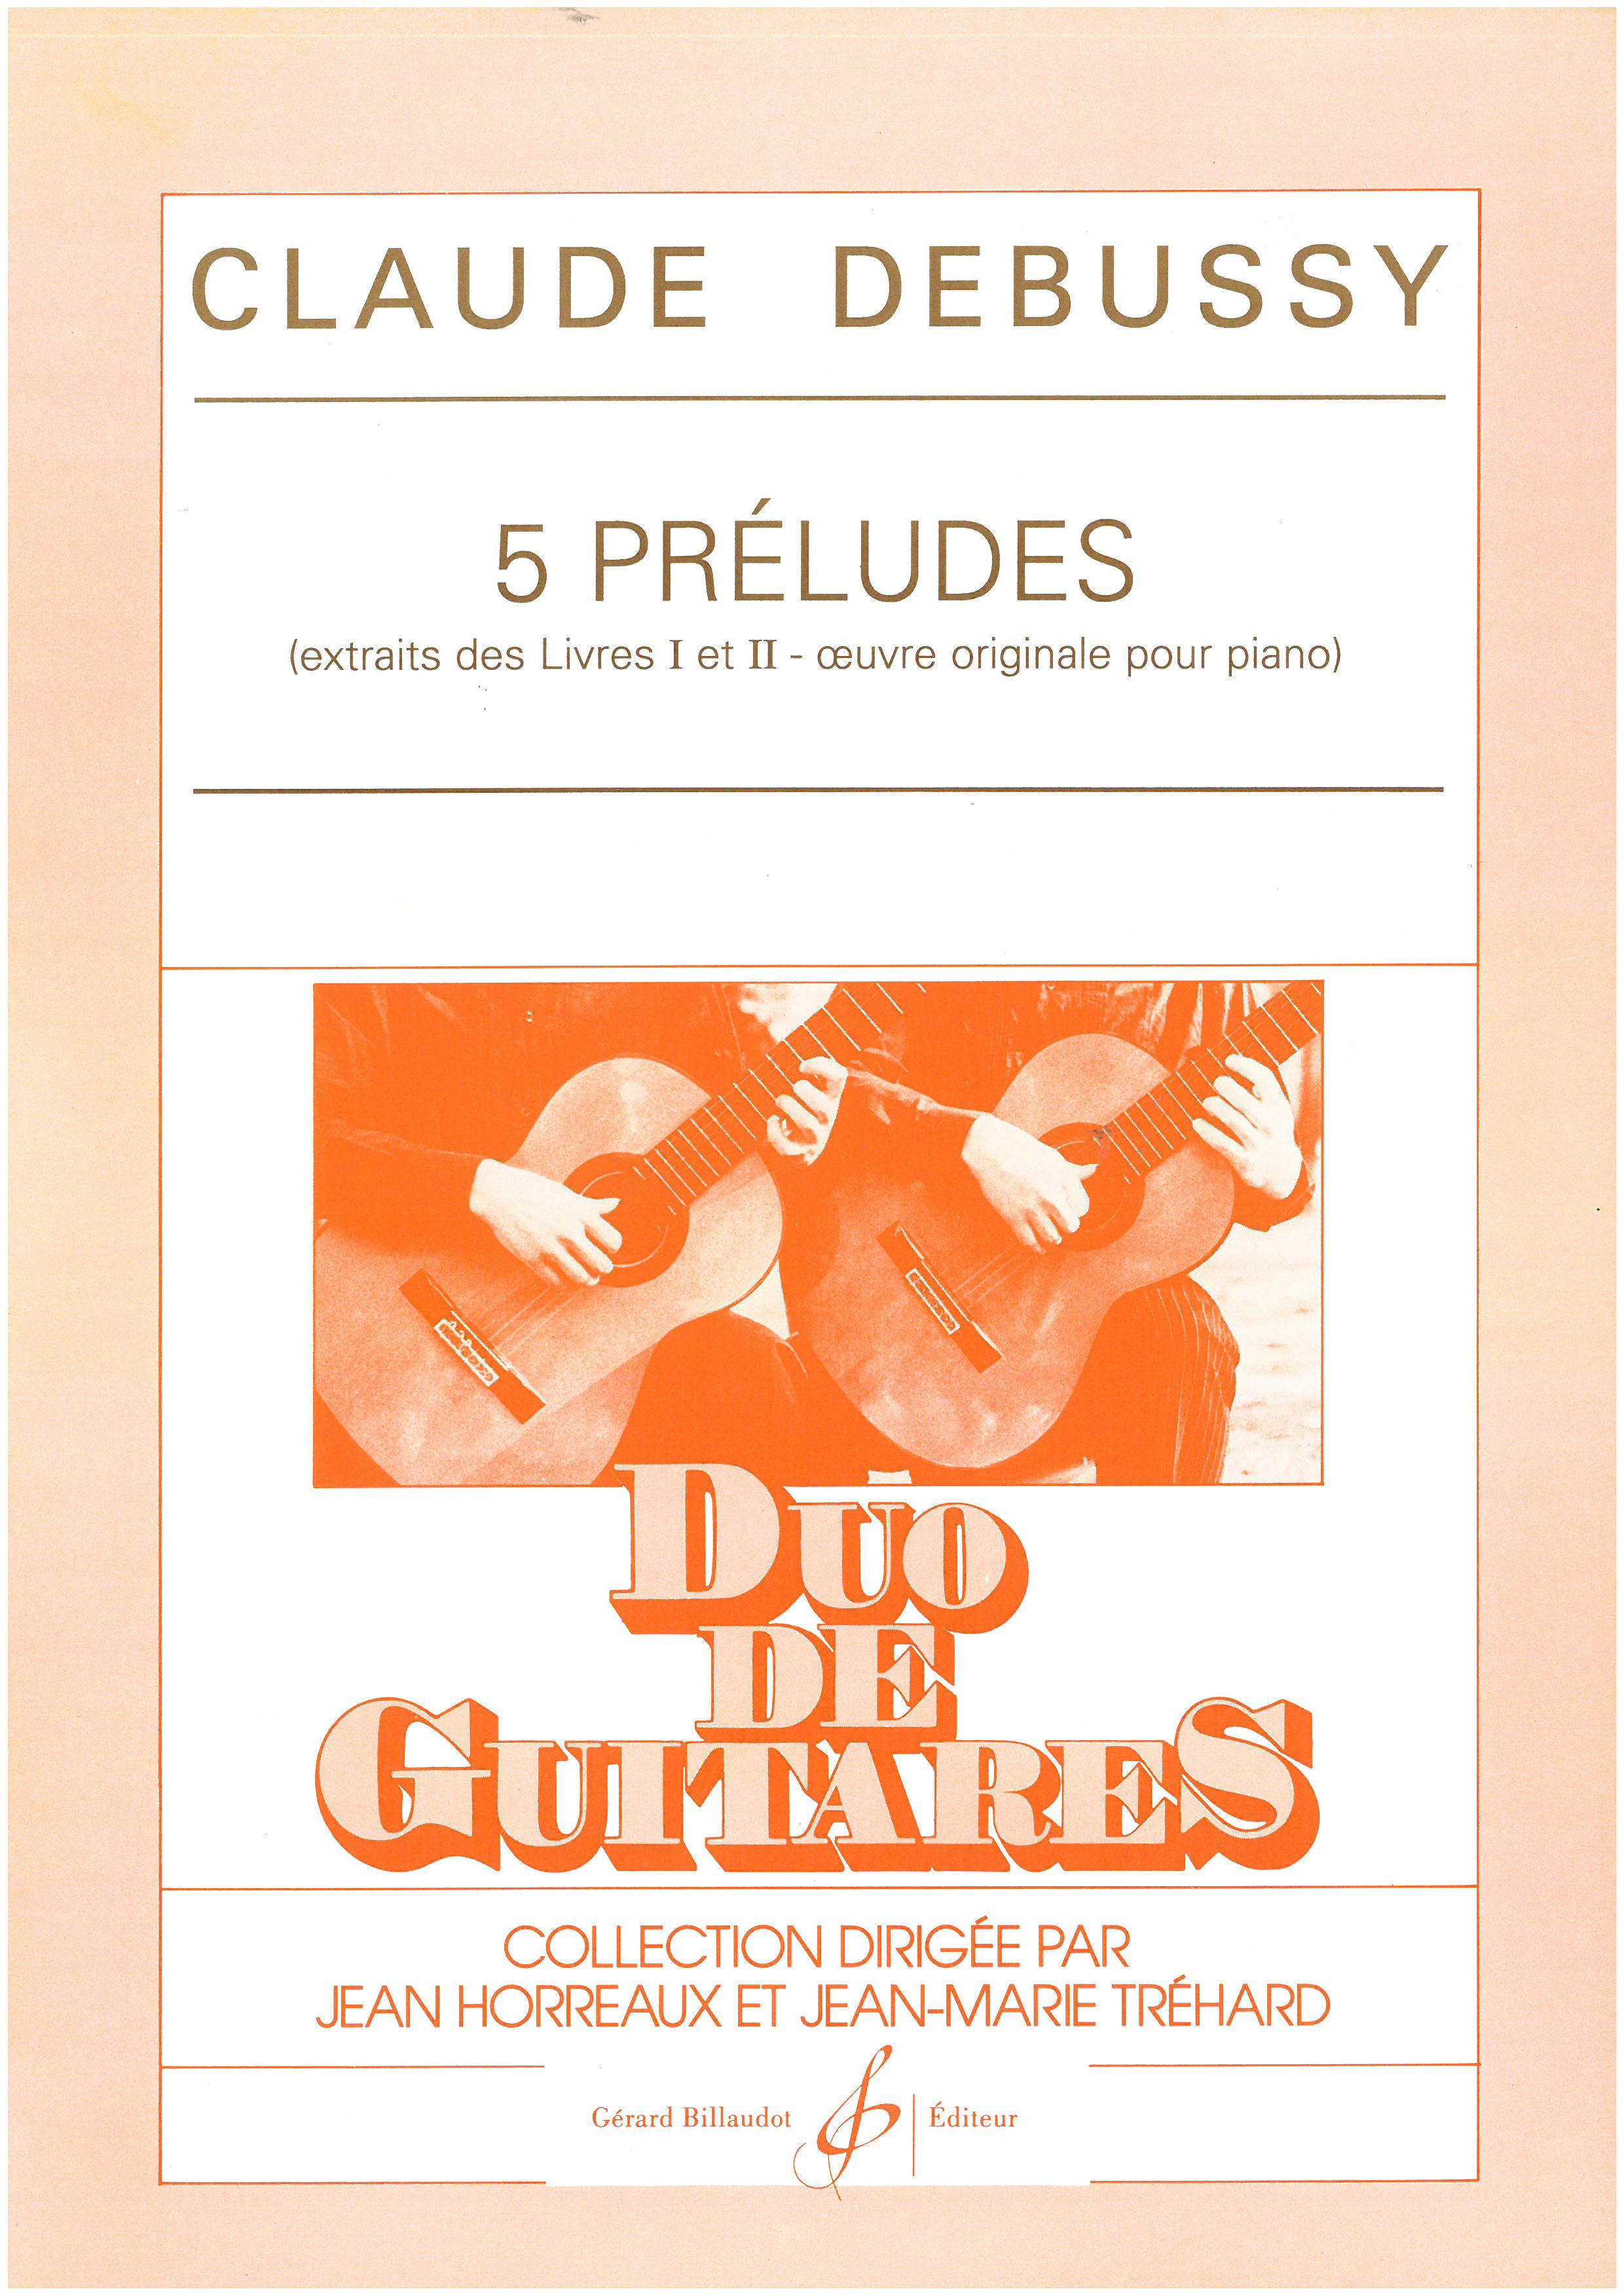 5 PRELUDES - EXTRAITS DES LIVRES I ET II